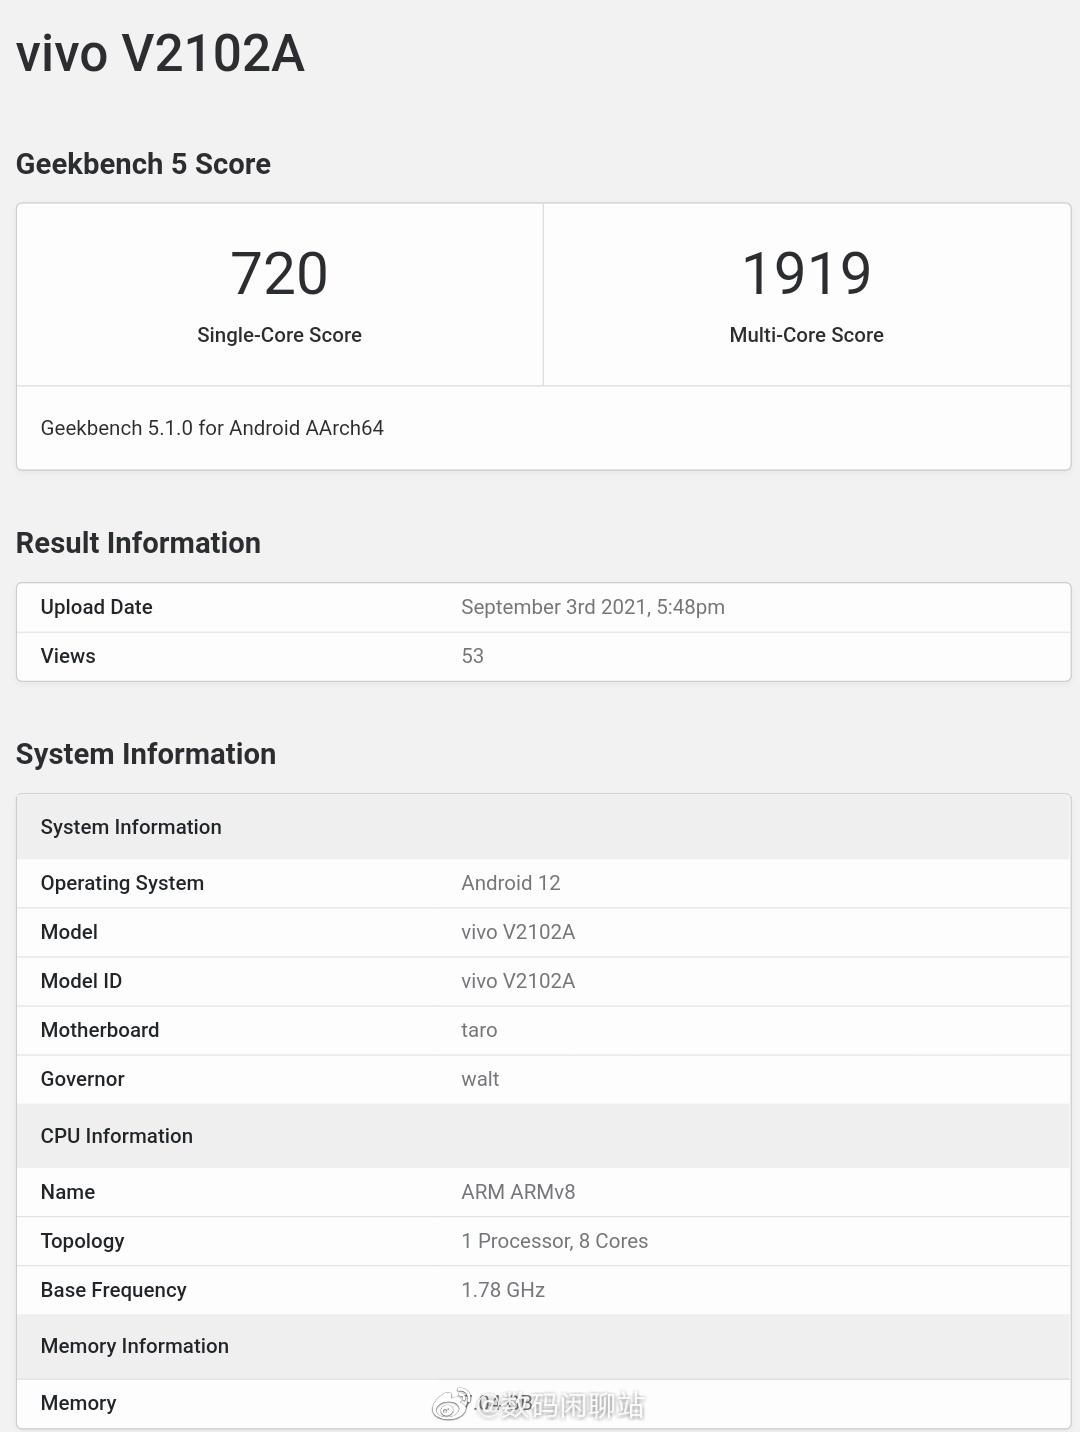 Vivo V2102A running Snapdragon 898 Geekbench Test